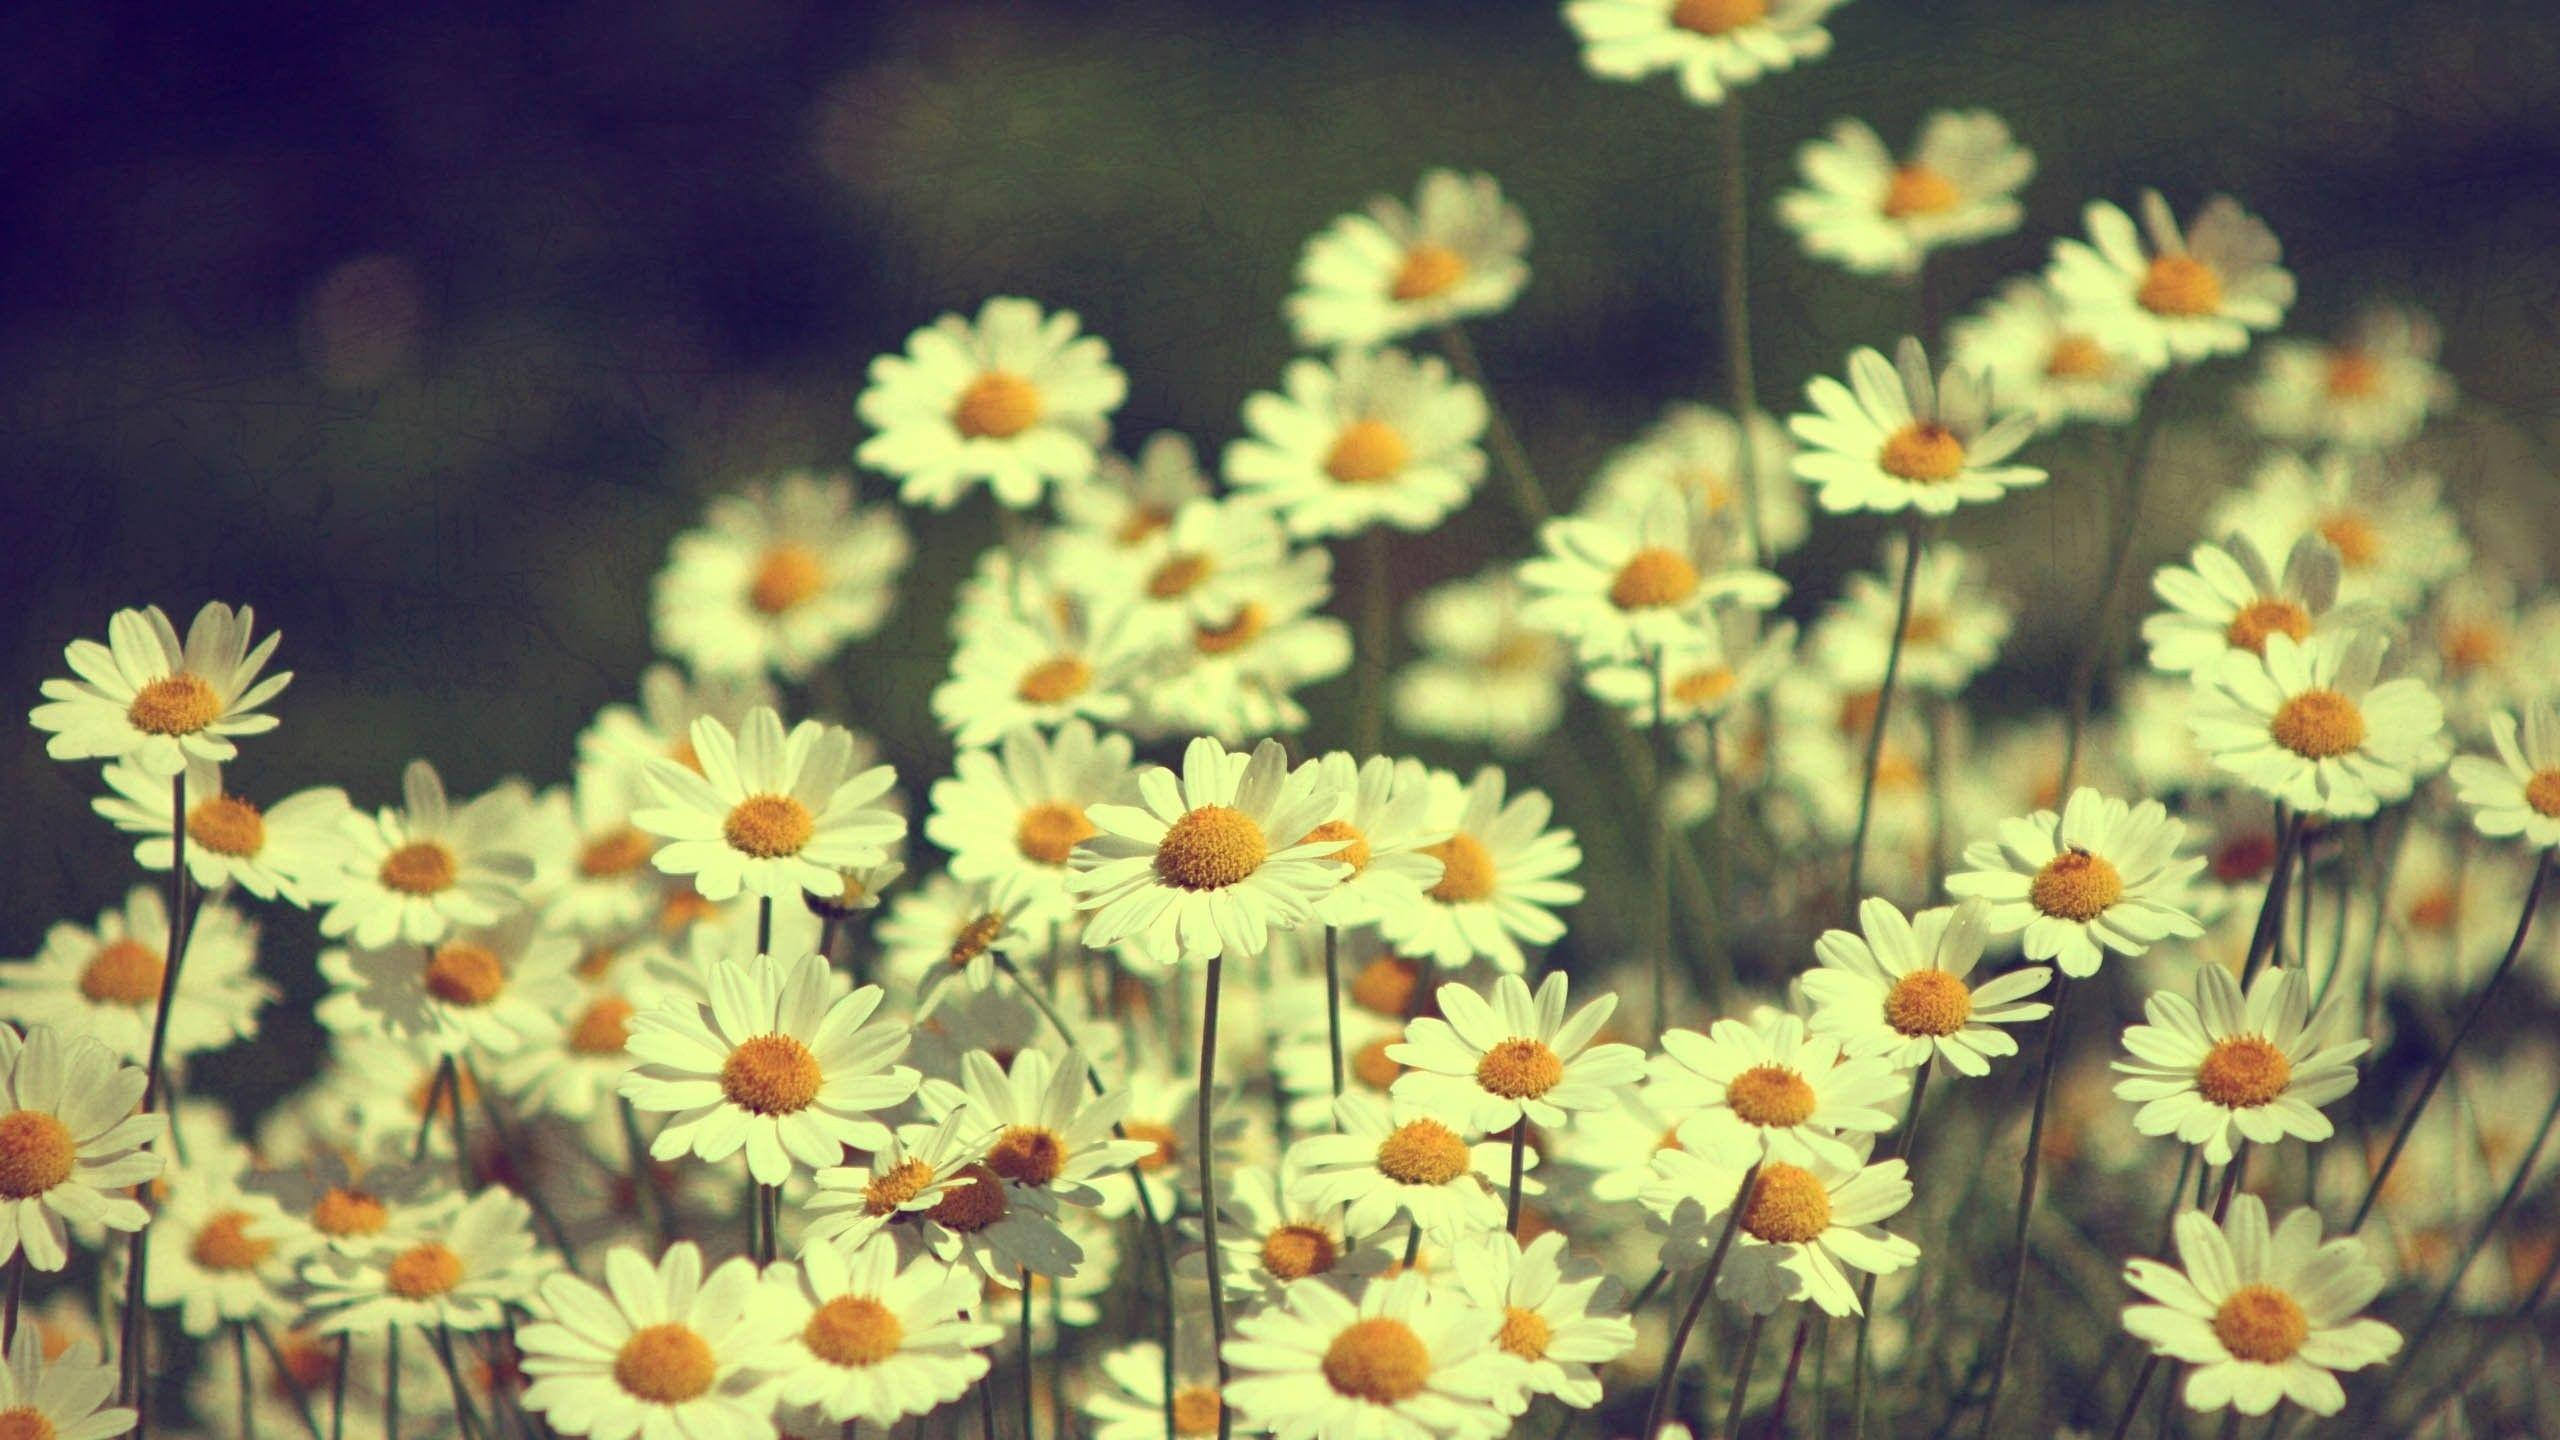 Vintage Flower Photography Backgrounds Vintage Flowers Wallpa...